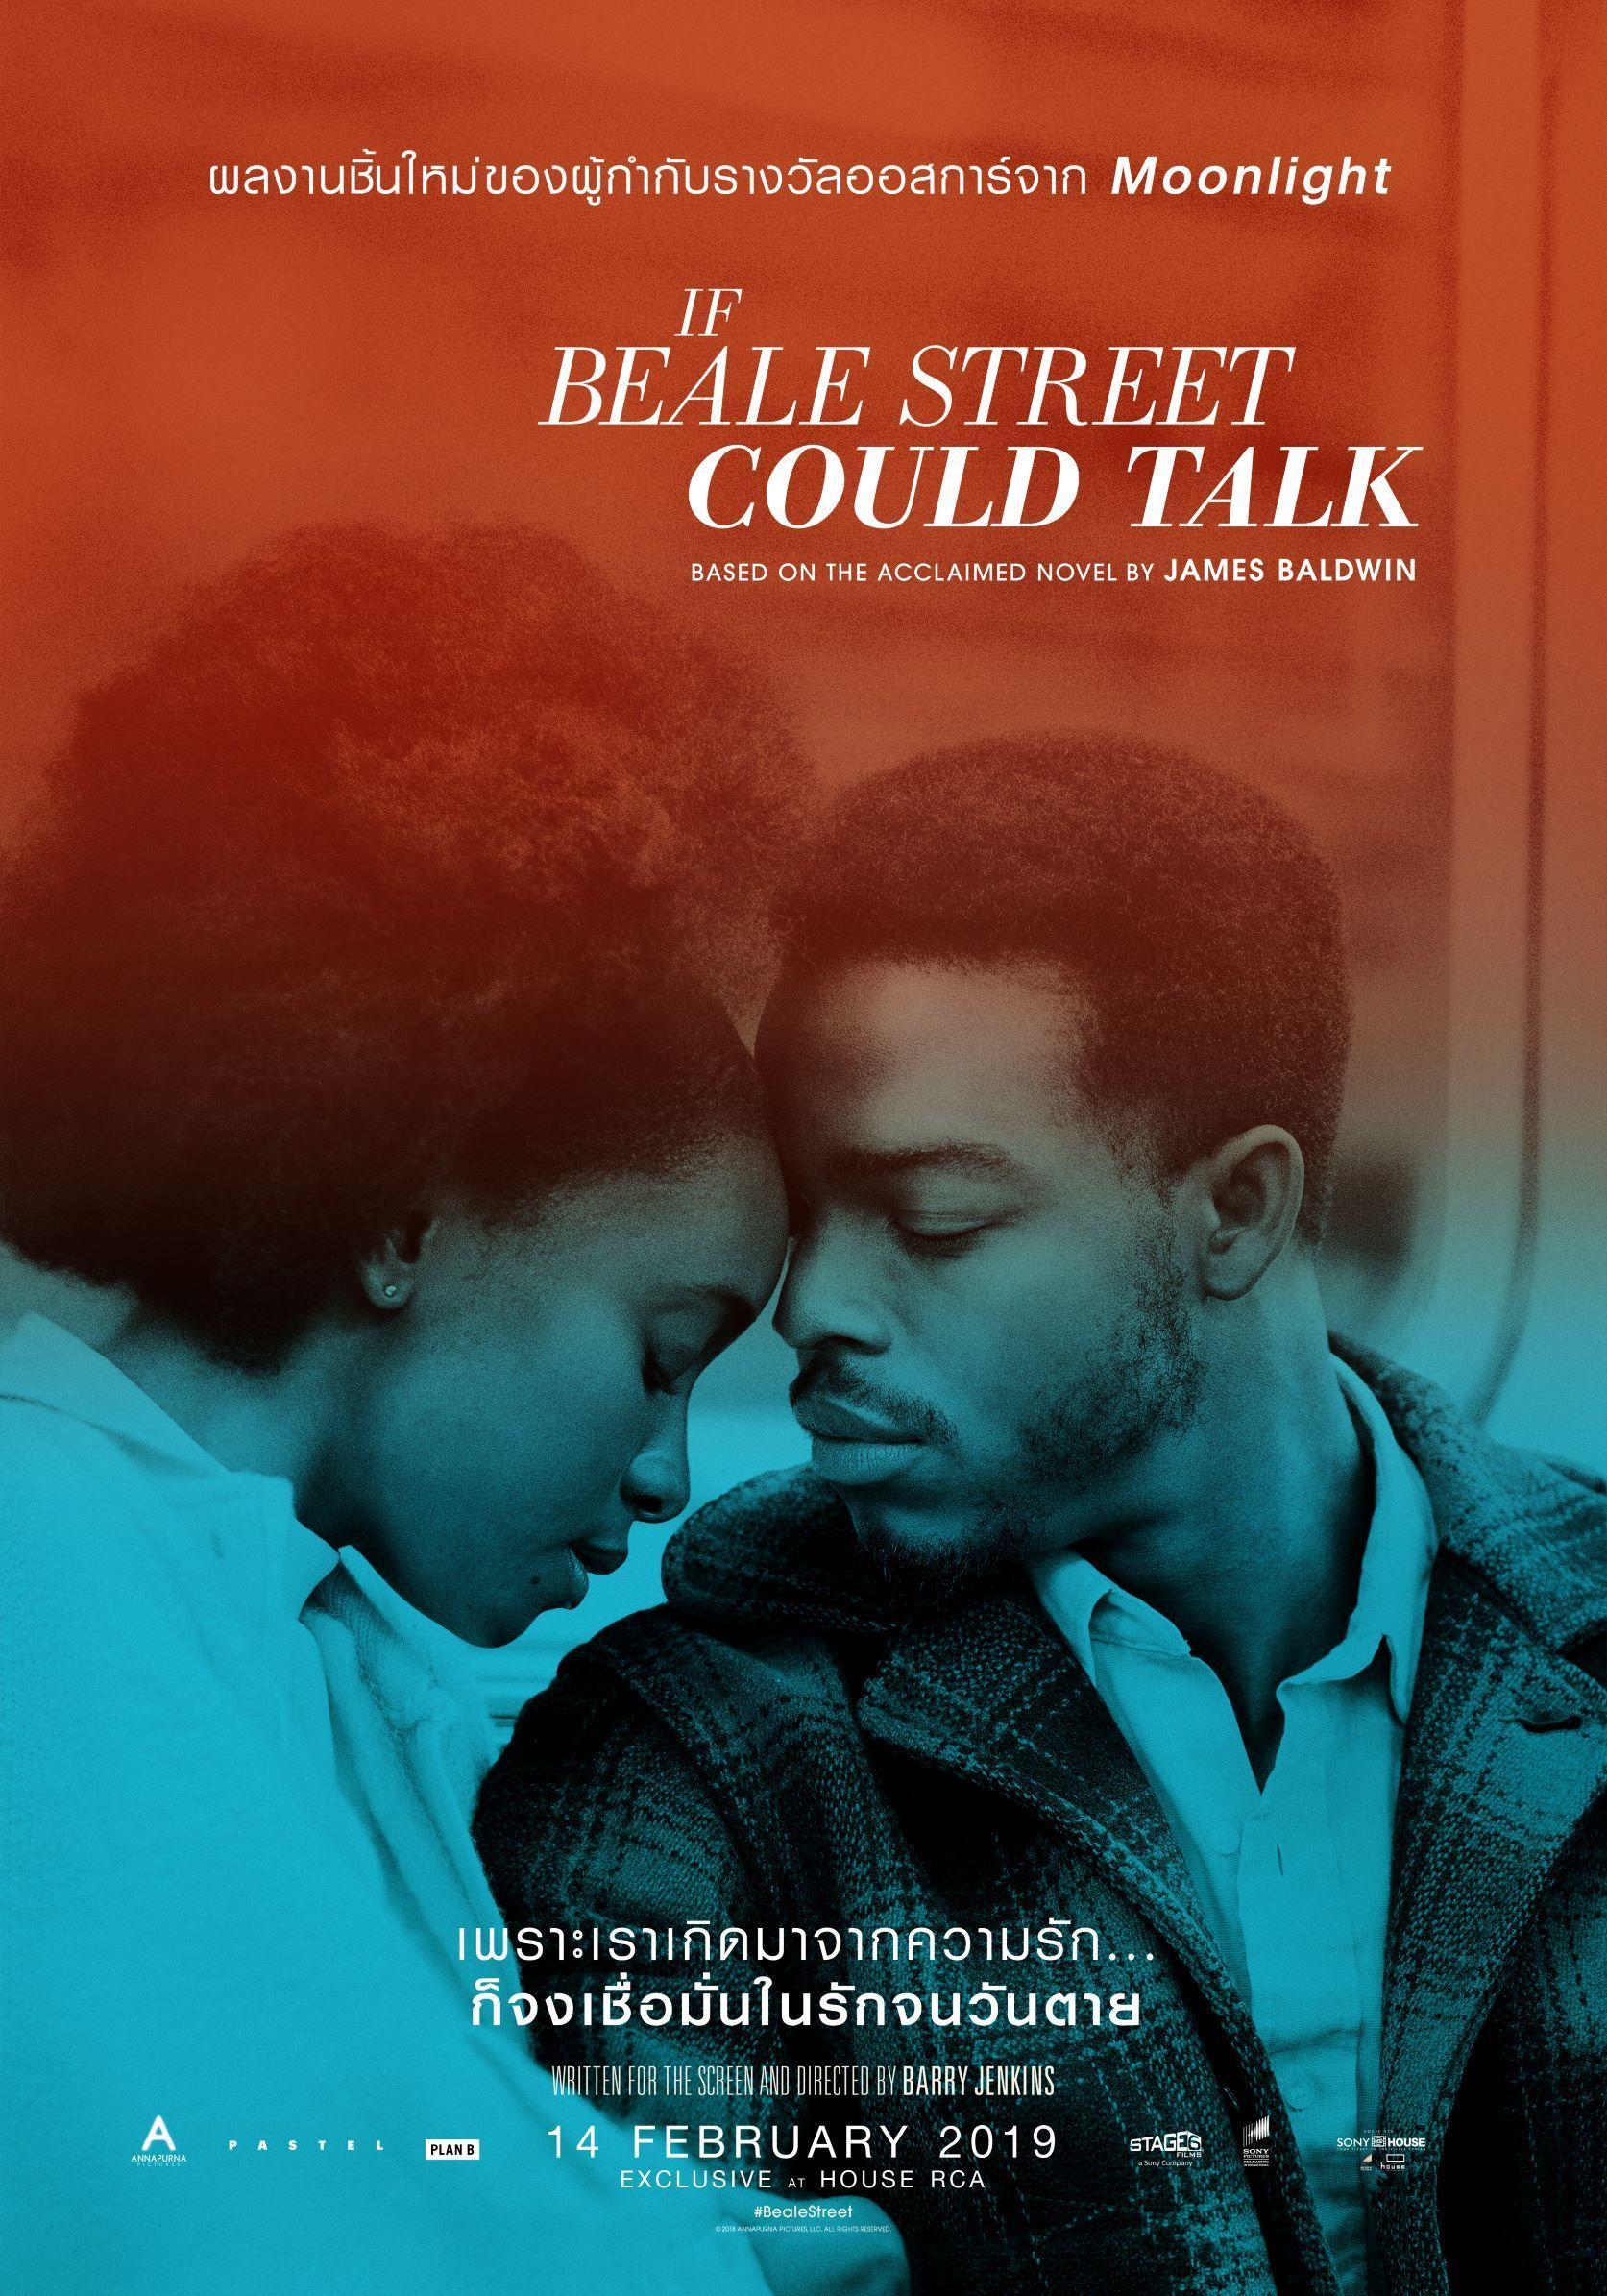 If Beale Street Could Talk (2018) ไม่อยากเจ็บจิ๋ม อย่าพูดกับพี่